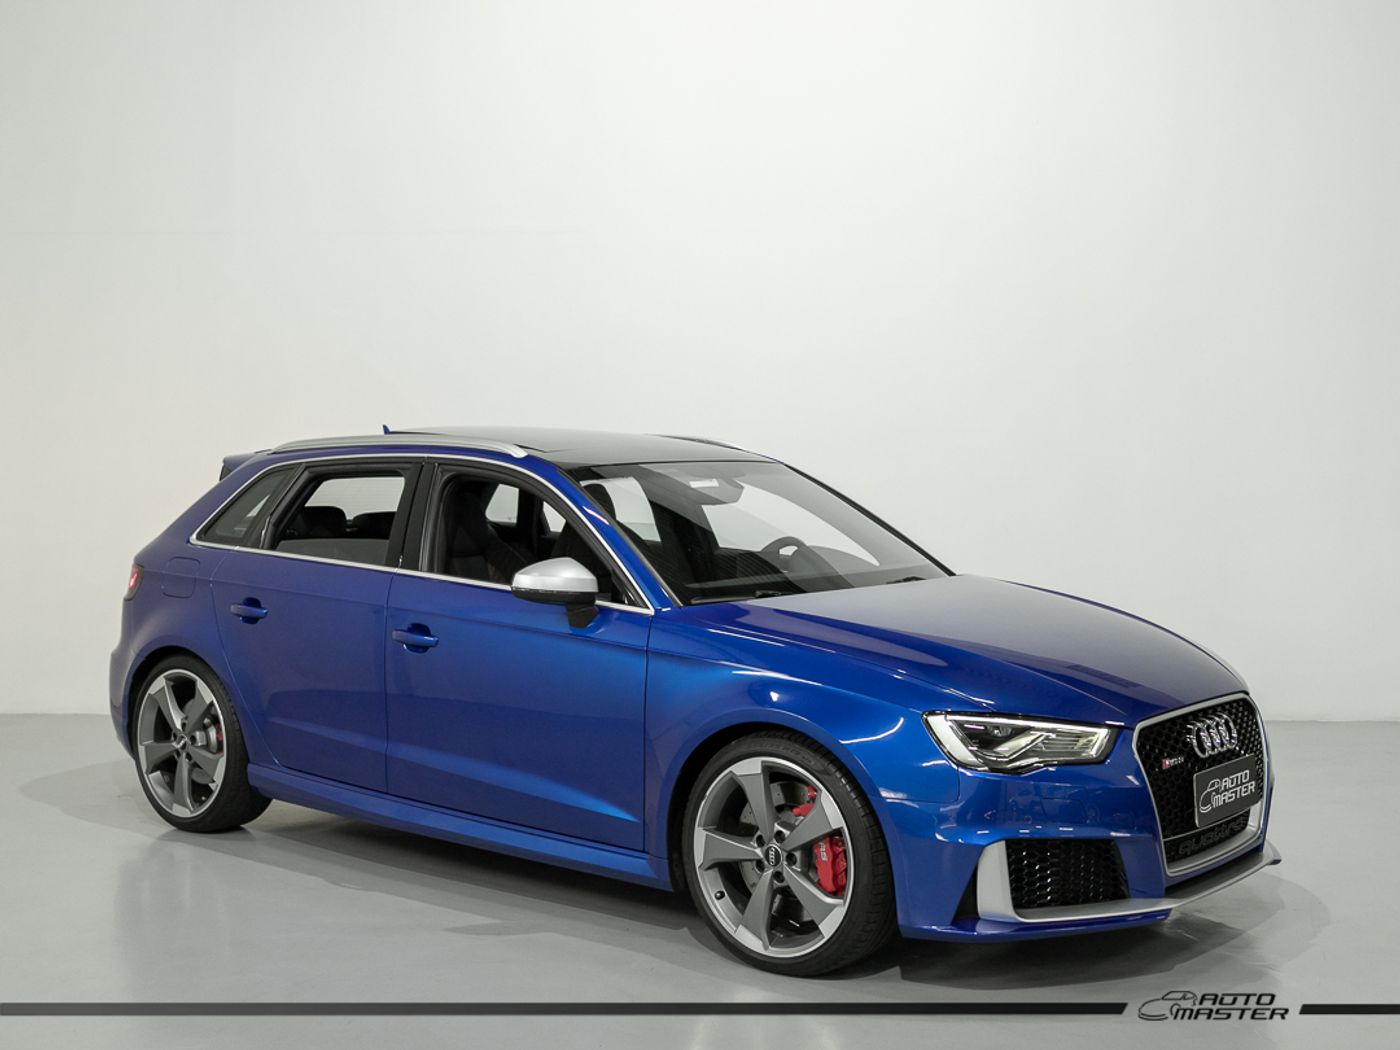 Audi RS3 Sportback 2.5 TFSI Quattro S-tronic